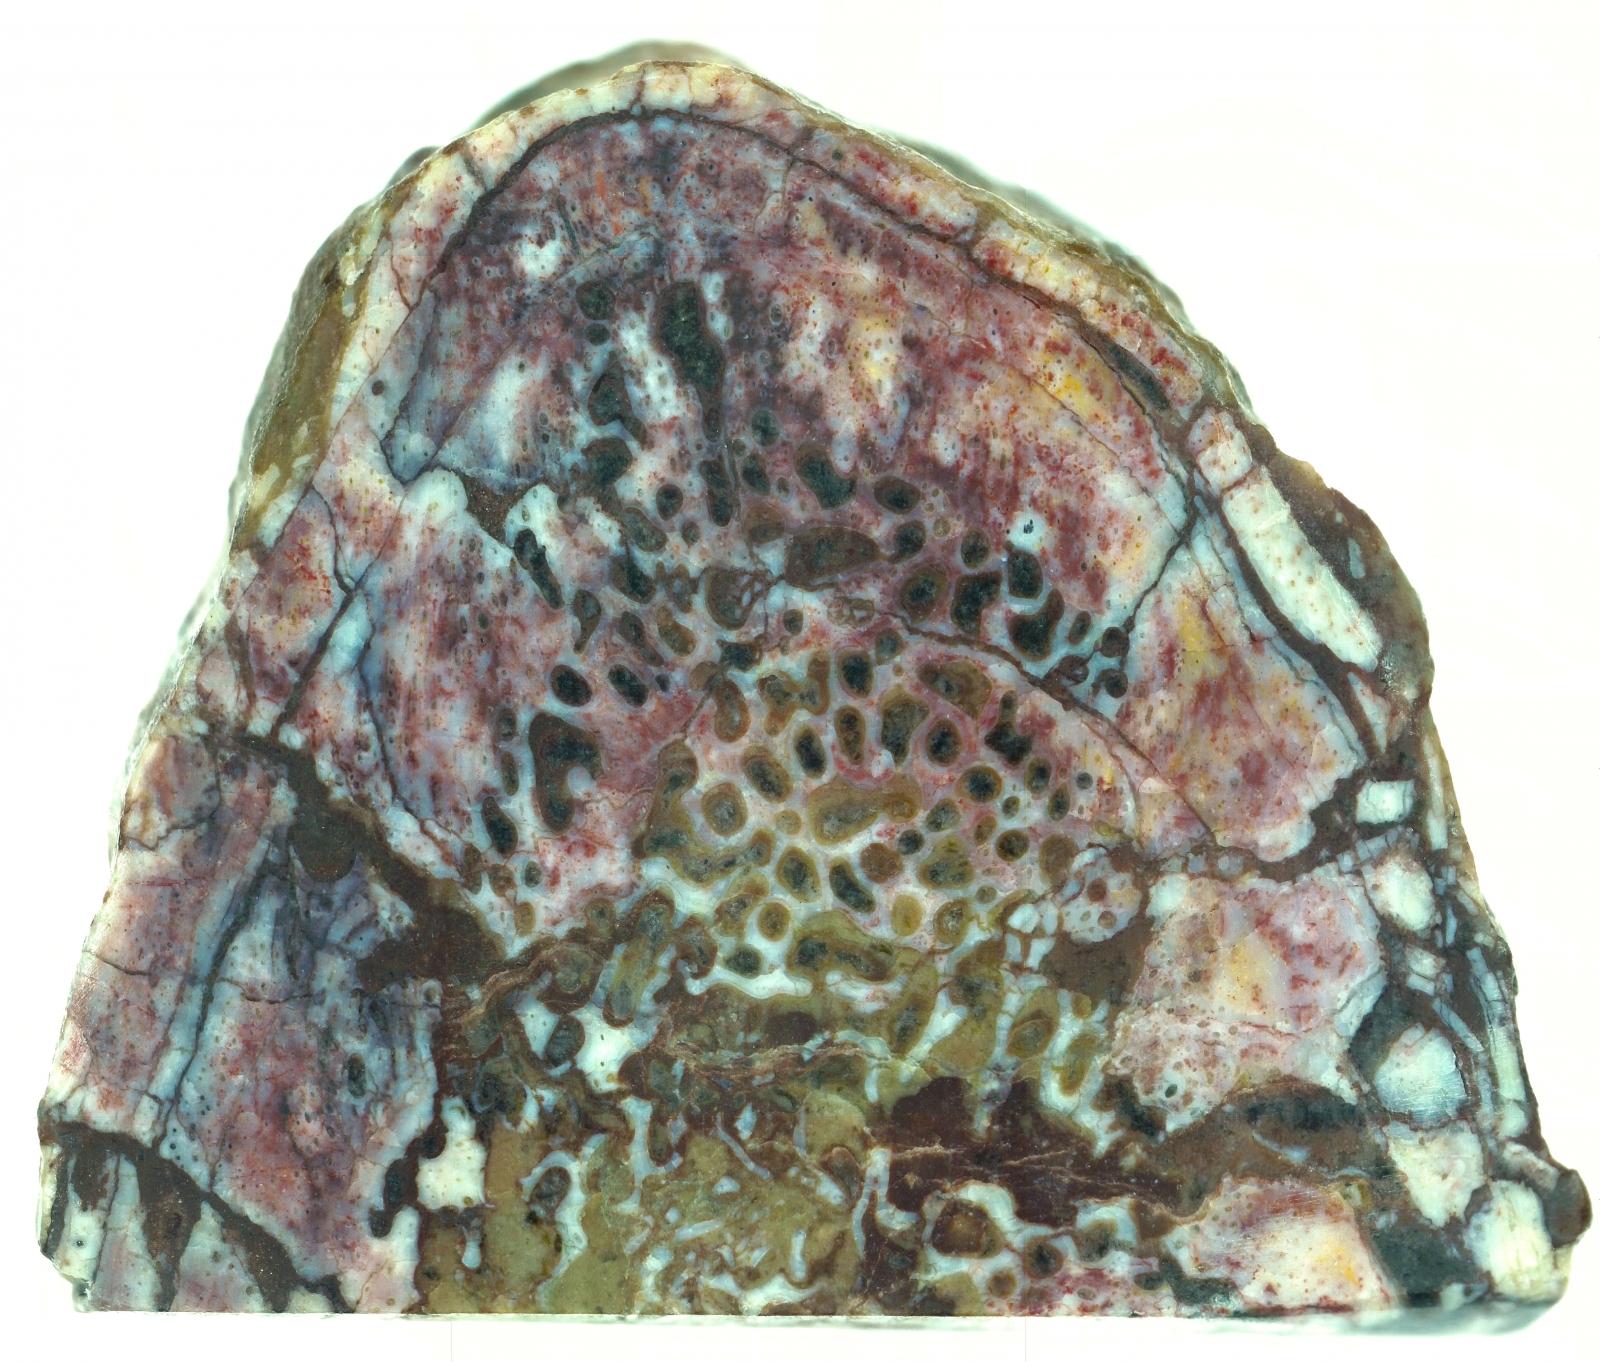 Lufengosaurus rib